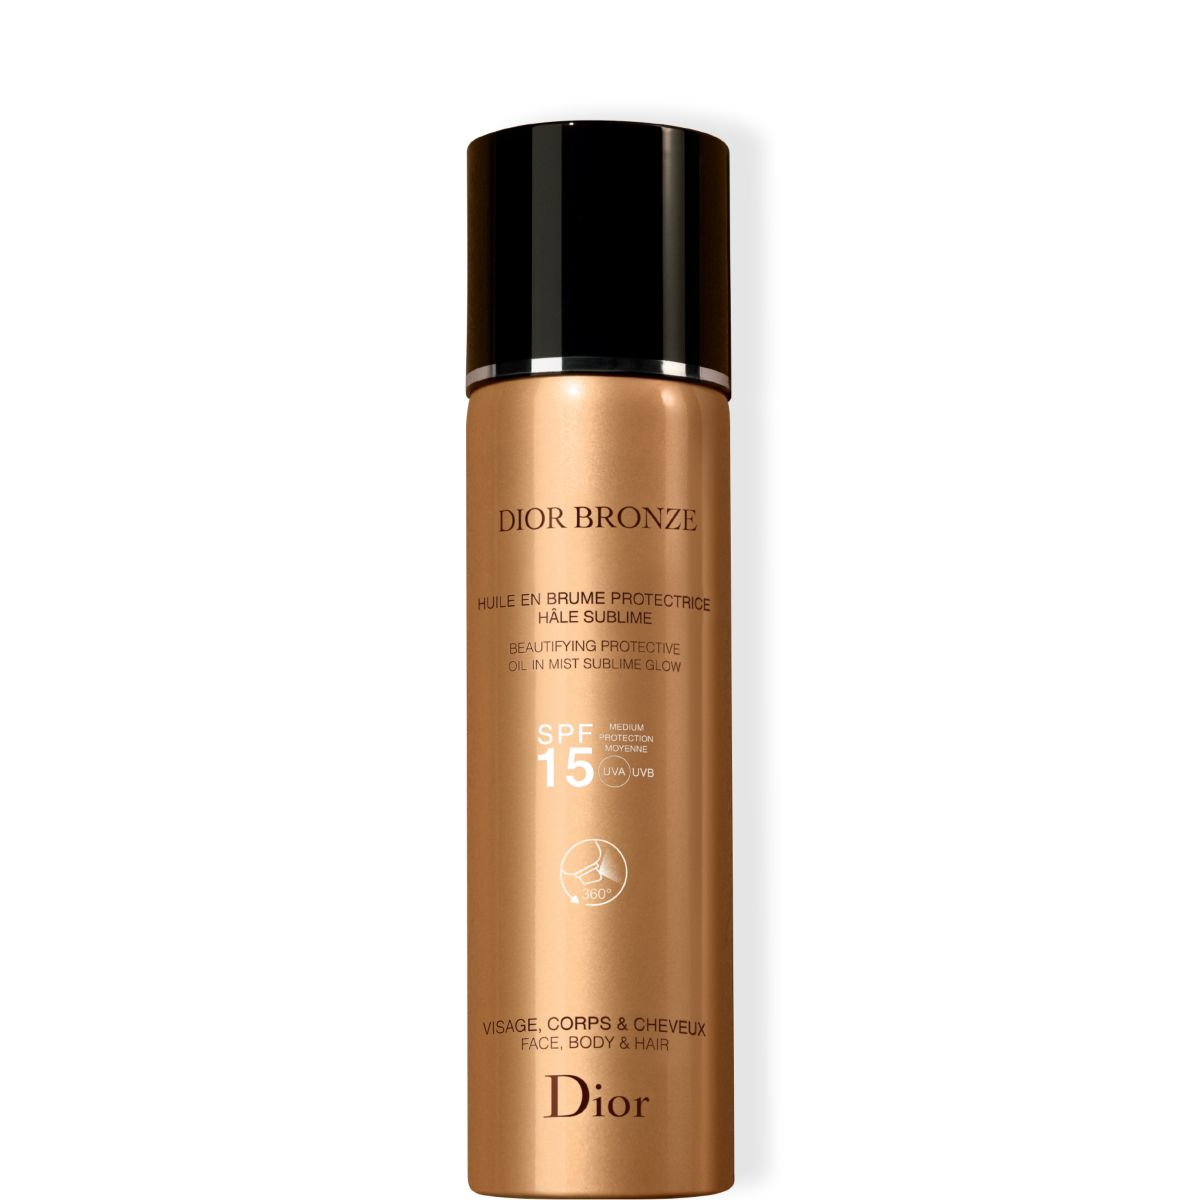 Dior - Dior Bronze - Huile en Brume SPF15 - 100 ml